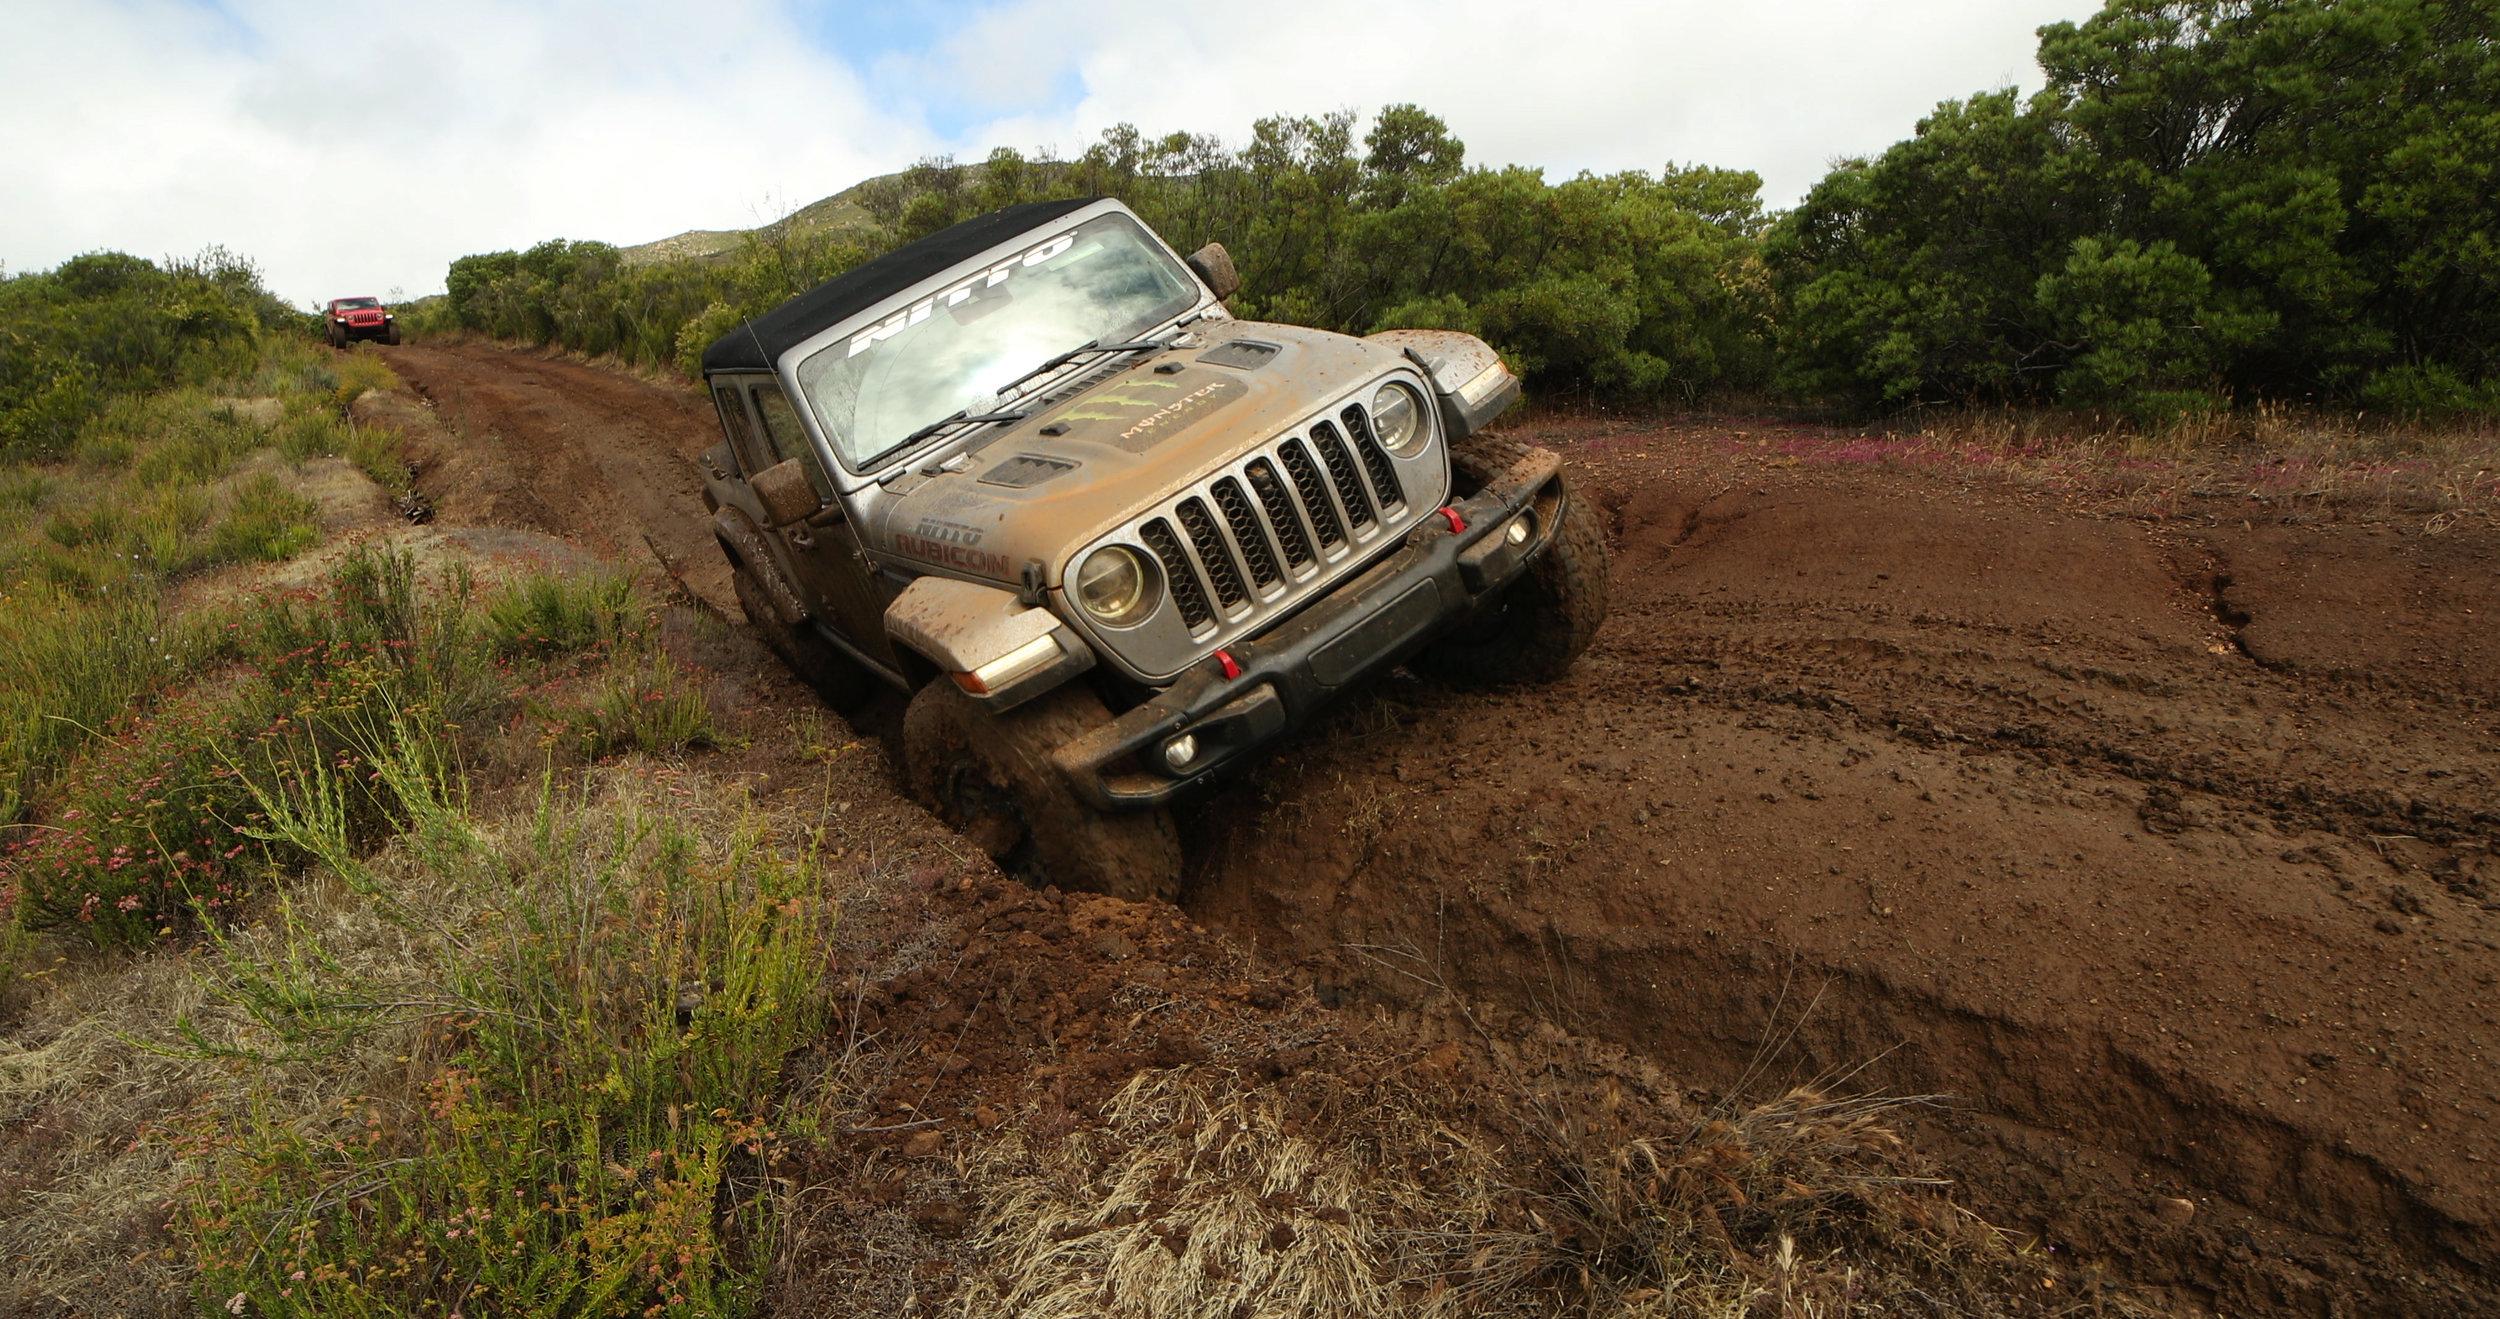 6_24_CaseyCurrie_Baja500PreRunning_BajaMexico_Jeep_027.jpg